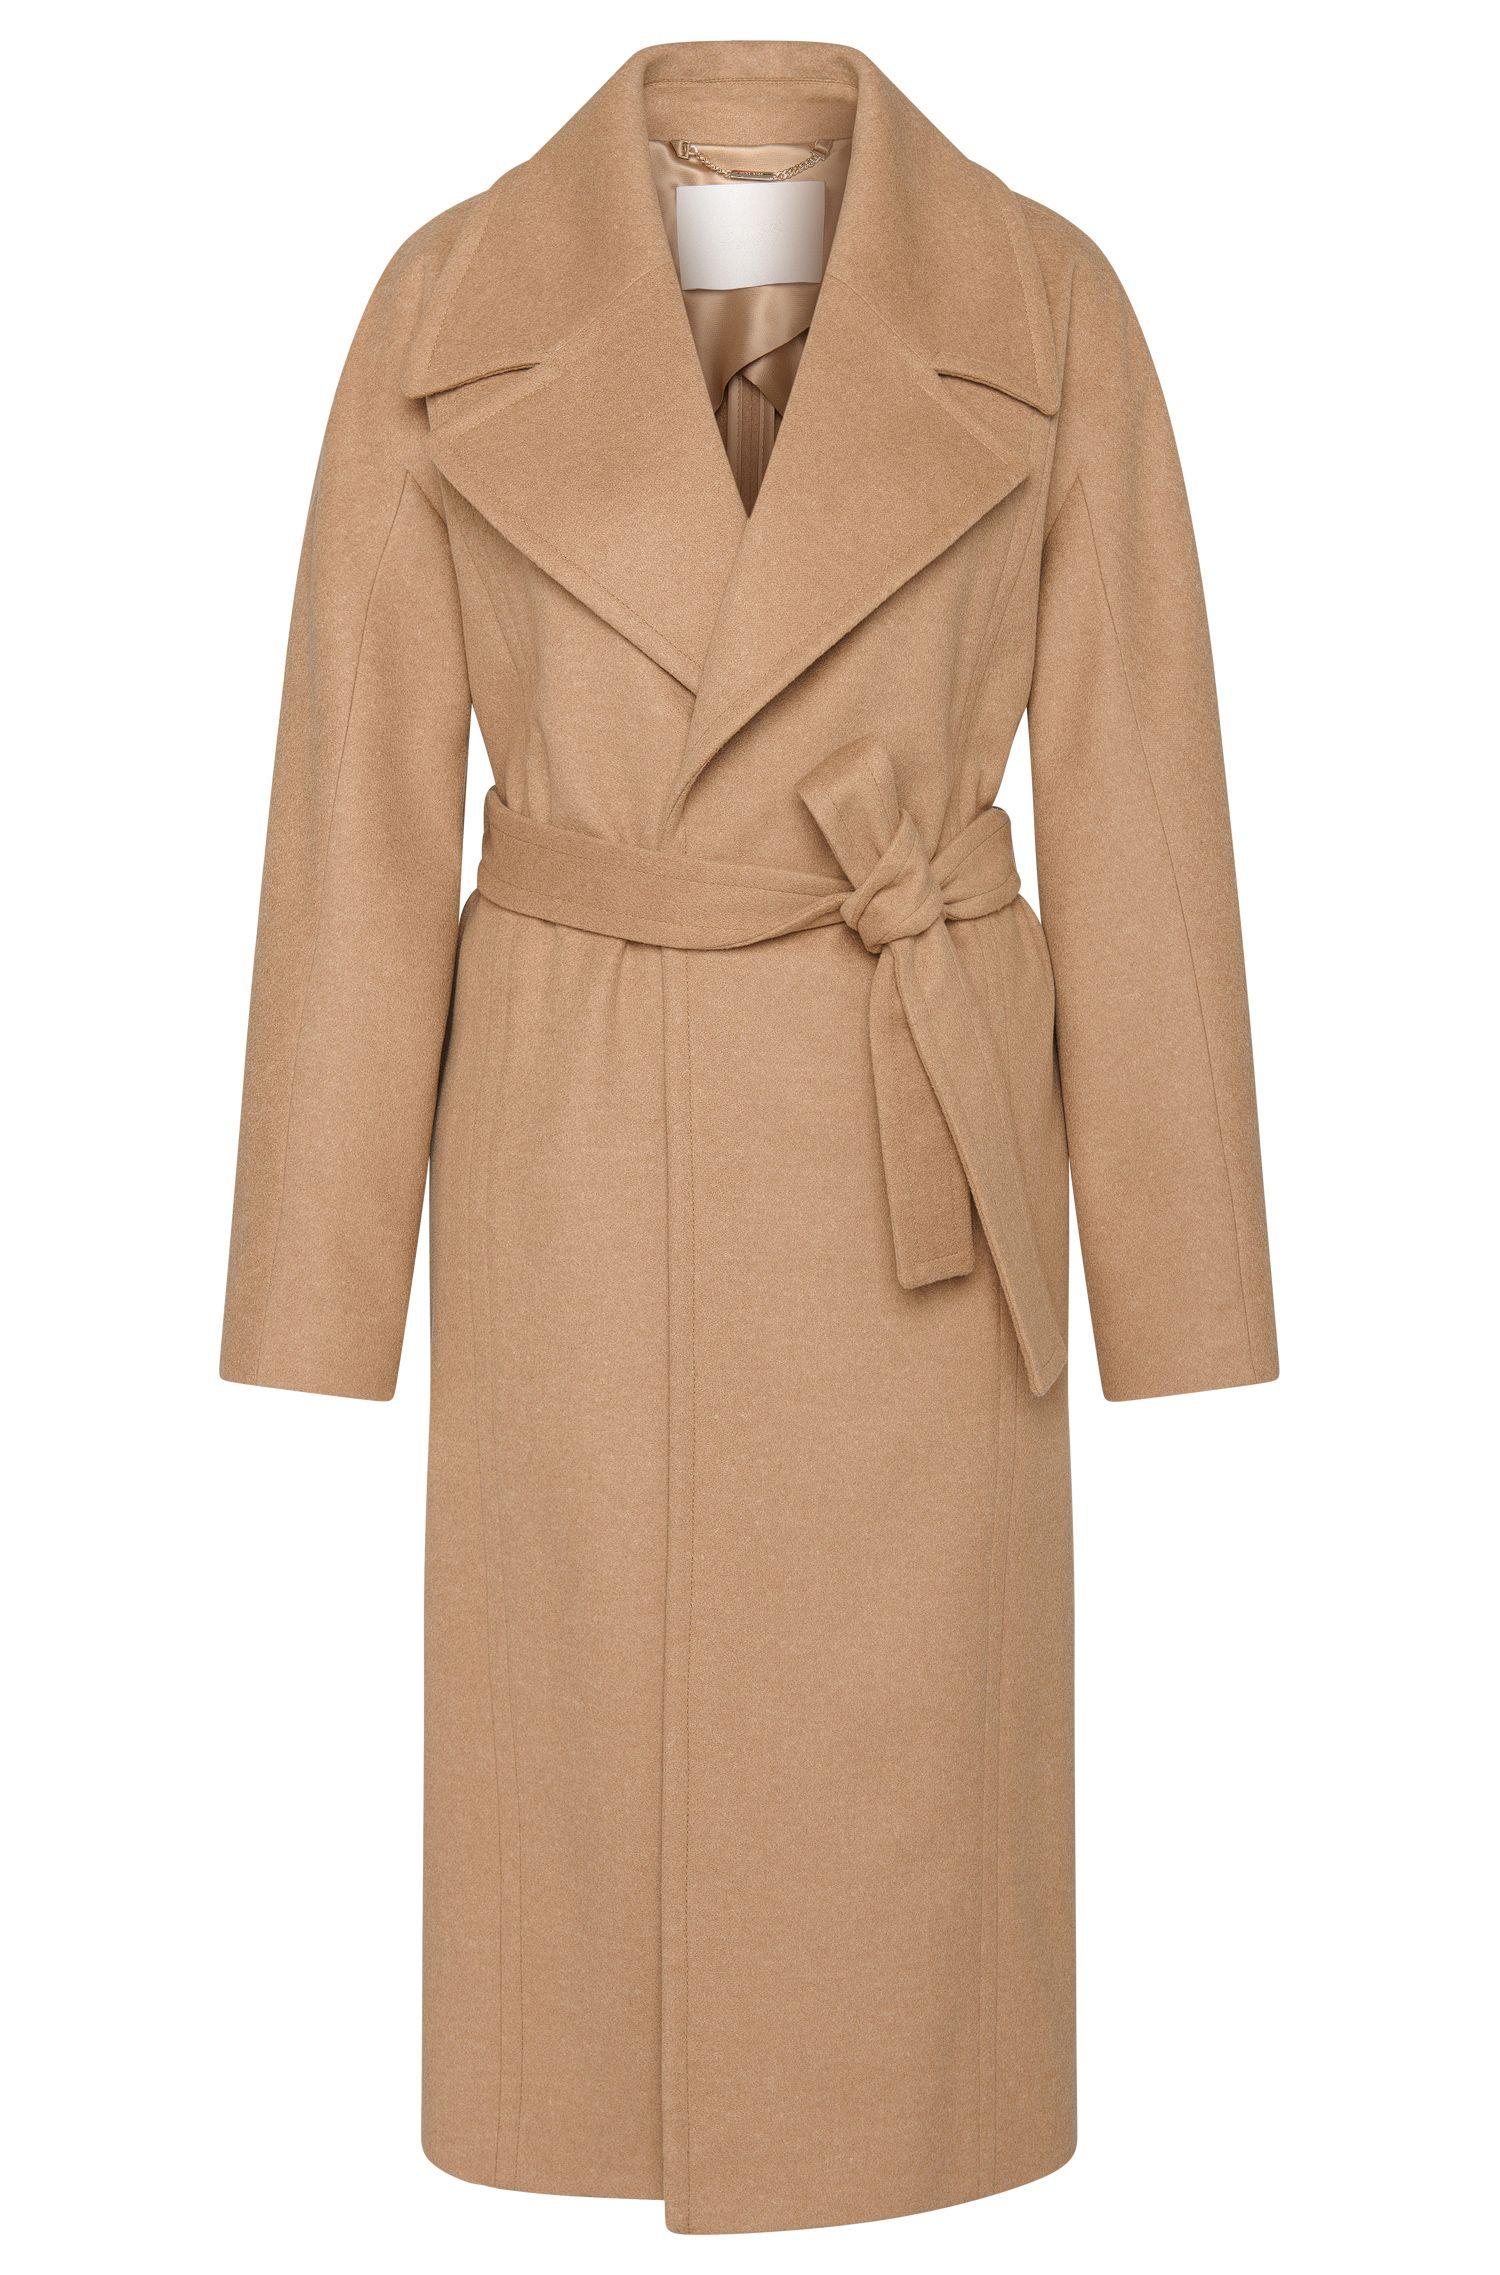 'Cordina'   Virgin Wool, Cashmere Belted Coat